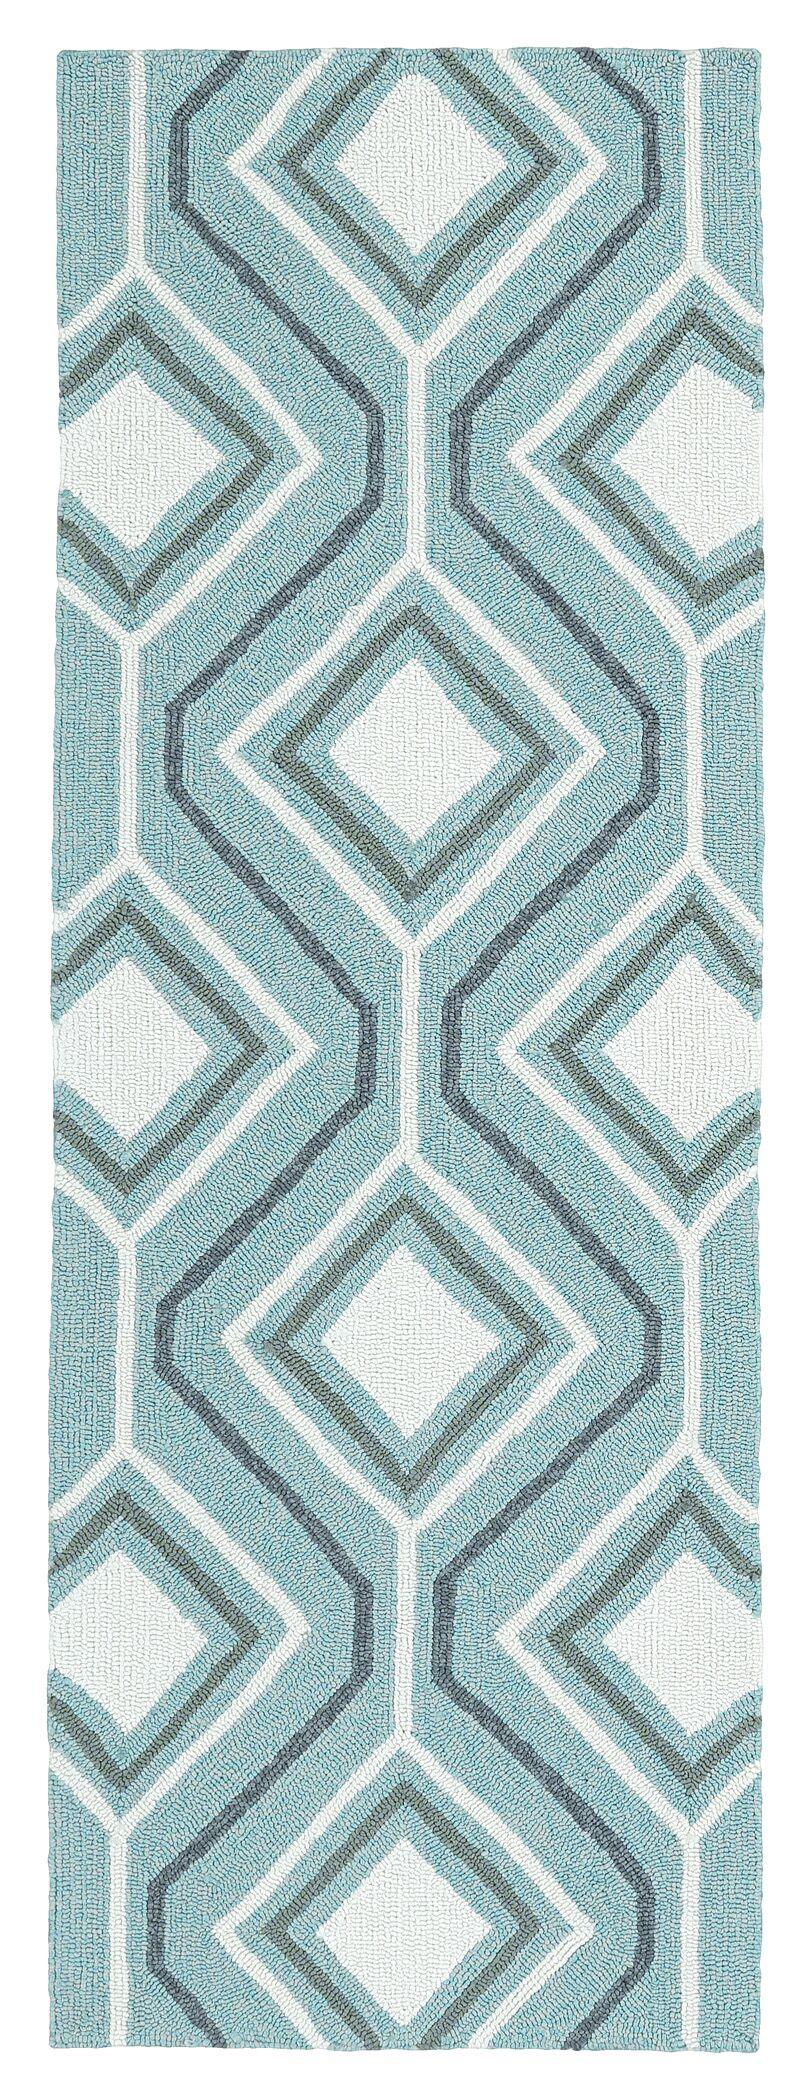 Doylestown Hand-Tufted Blue Indoor/Outdoor Area Rug Rug Size: Rectangle 5' x 7'6